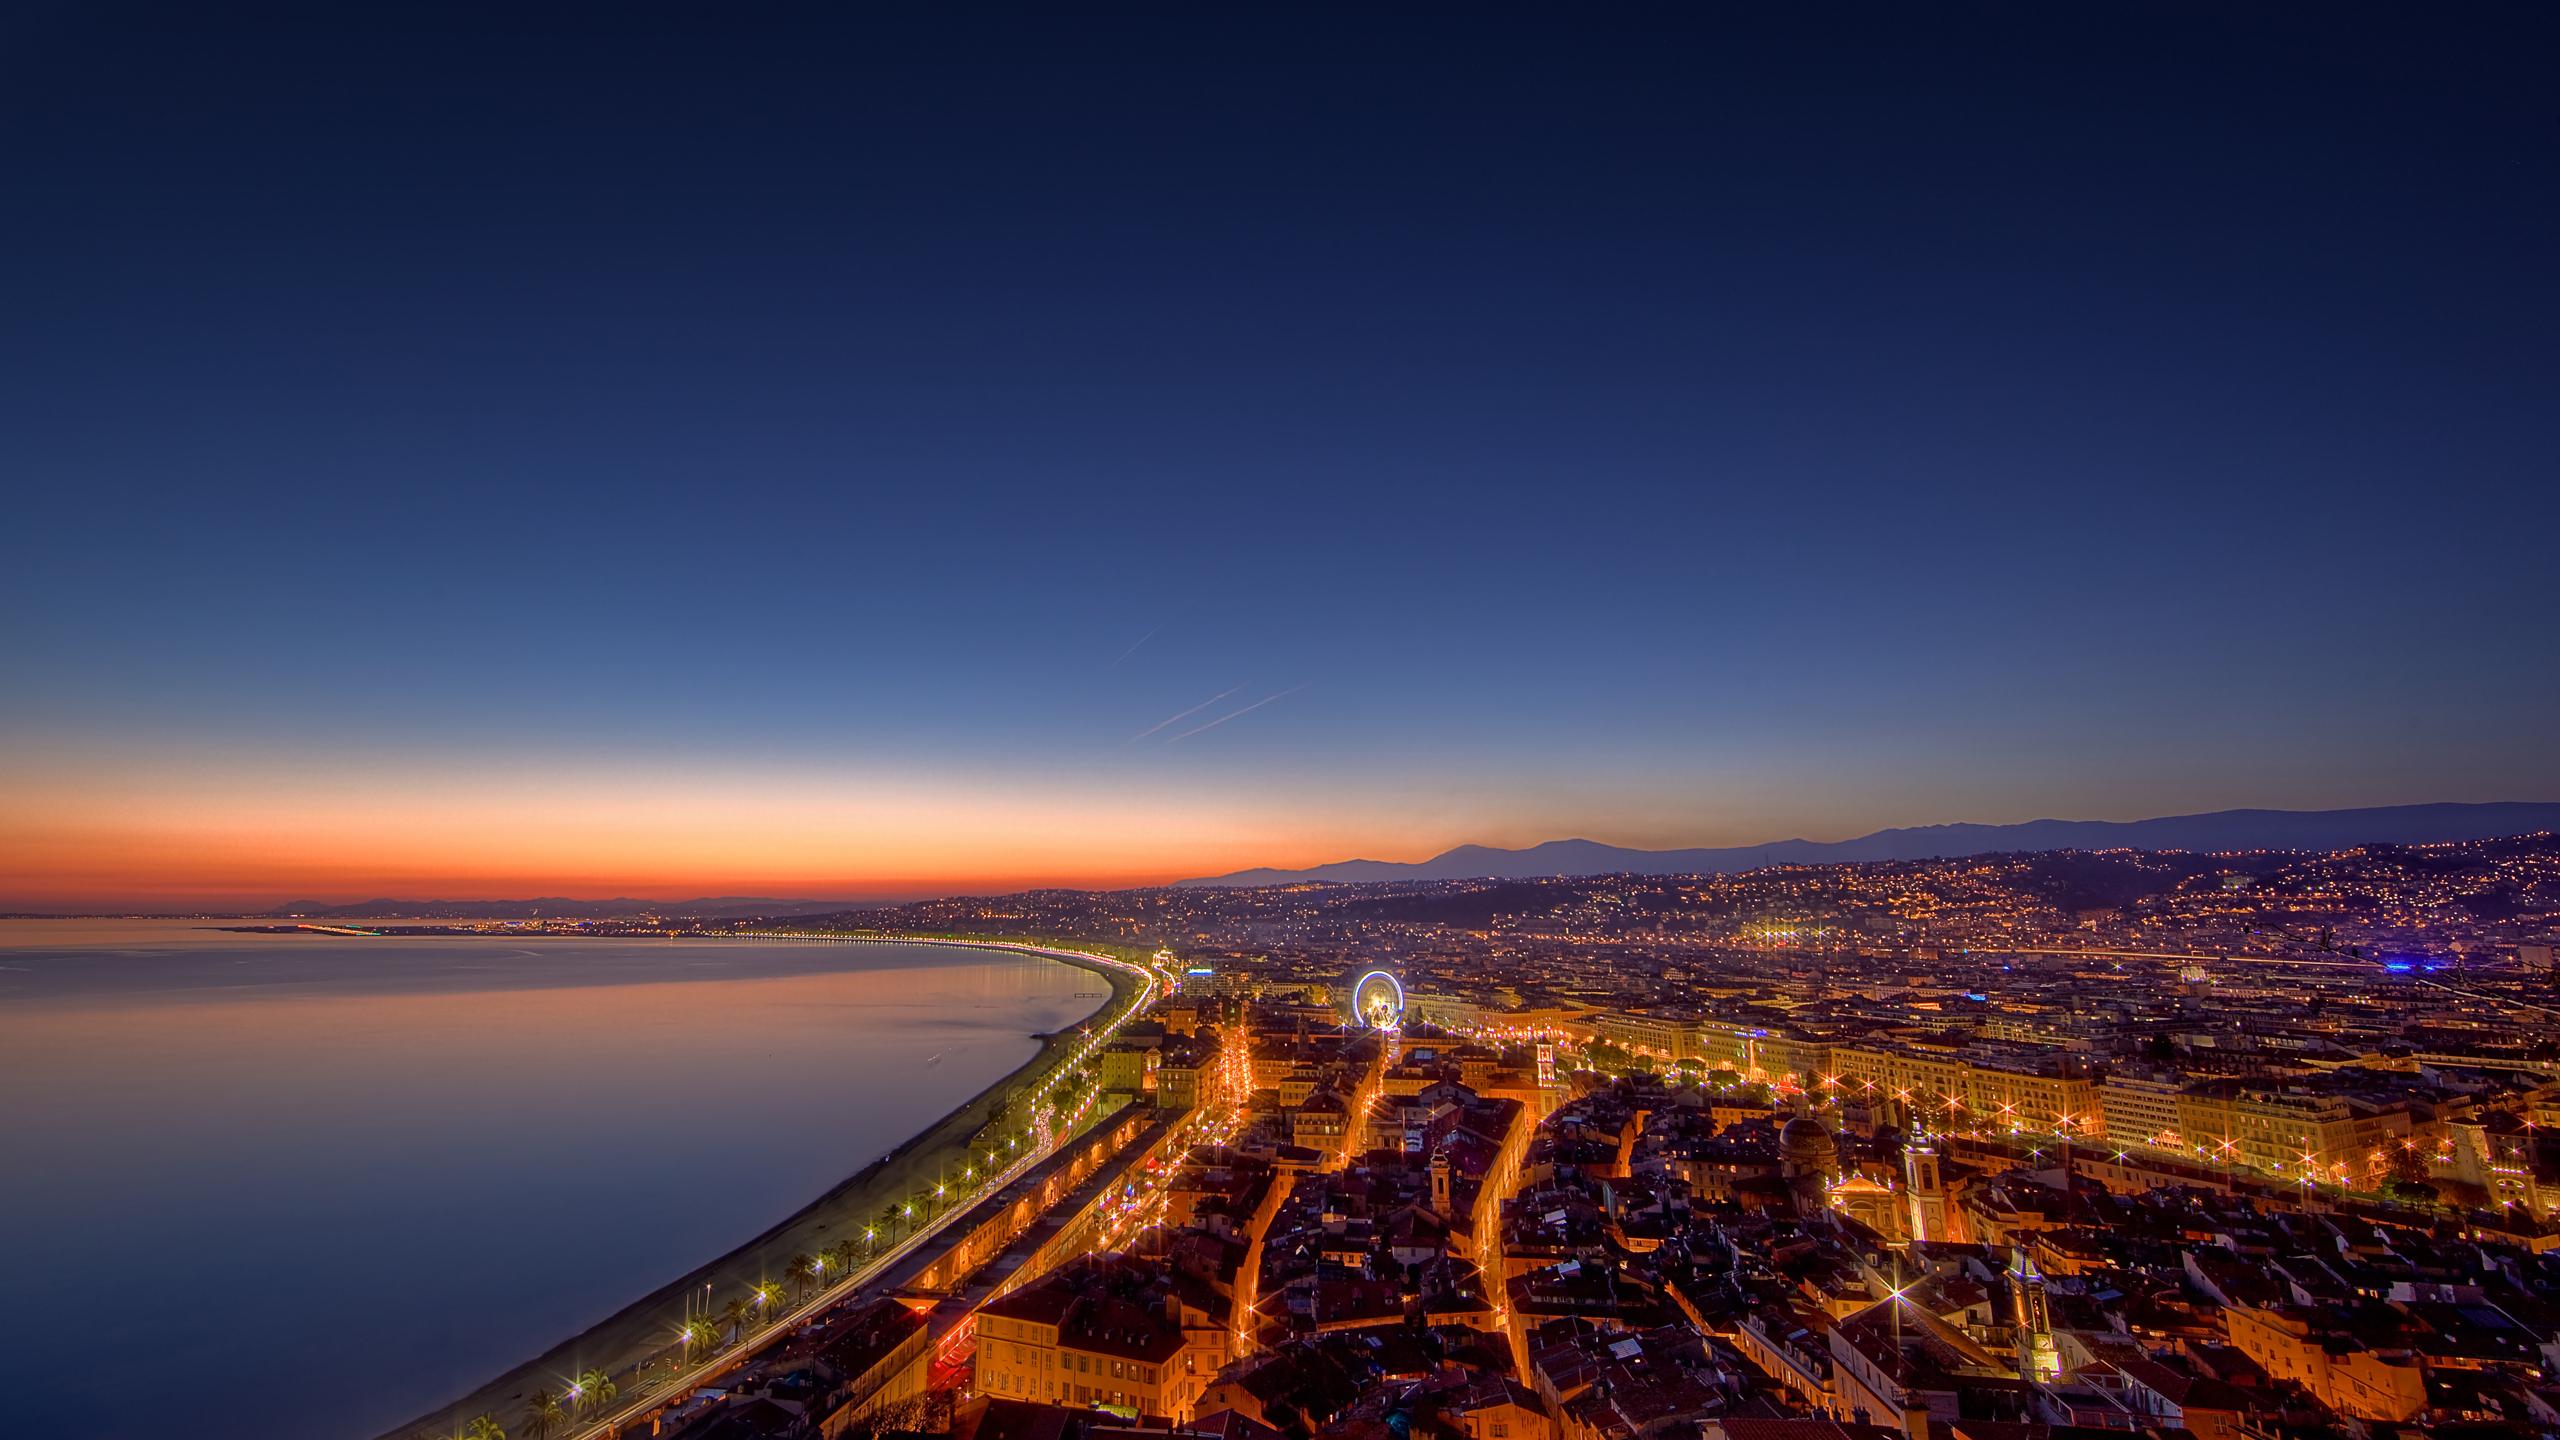 Cote D'Azur Coucher De Soleil Full HD Wallpaper And